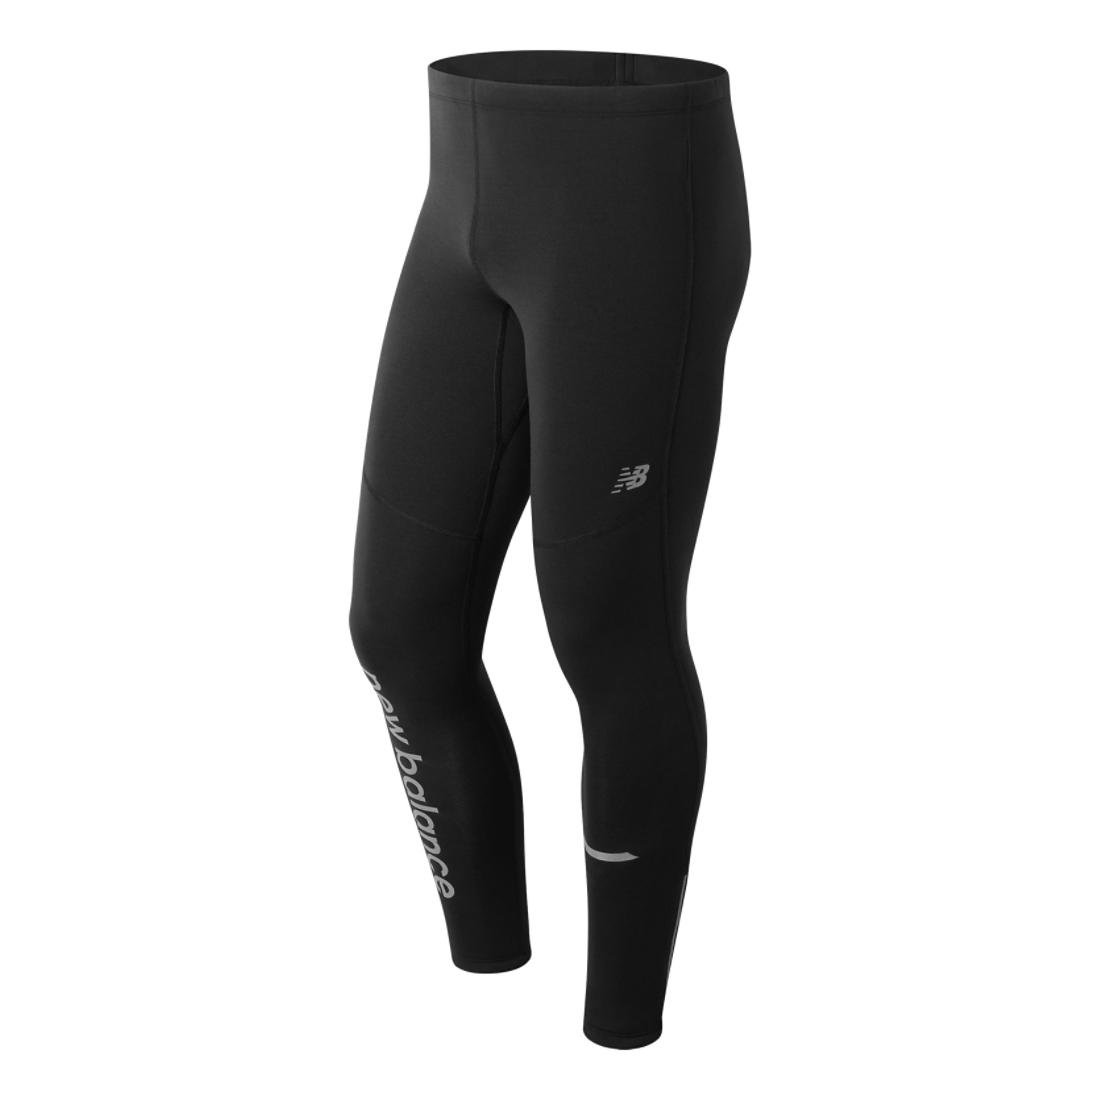 a499ce699e6b5 Amazon.com : New Balance Mens Performance Merino Tight, black, Large :  Clothing